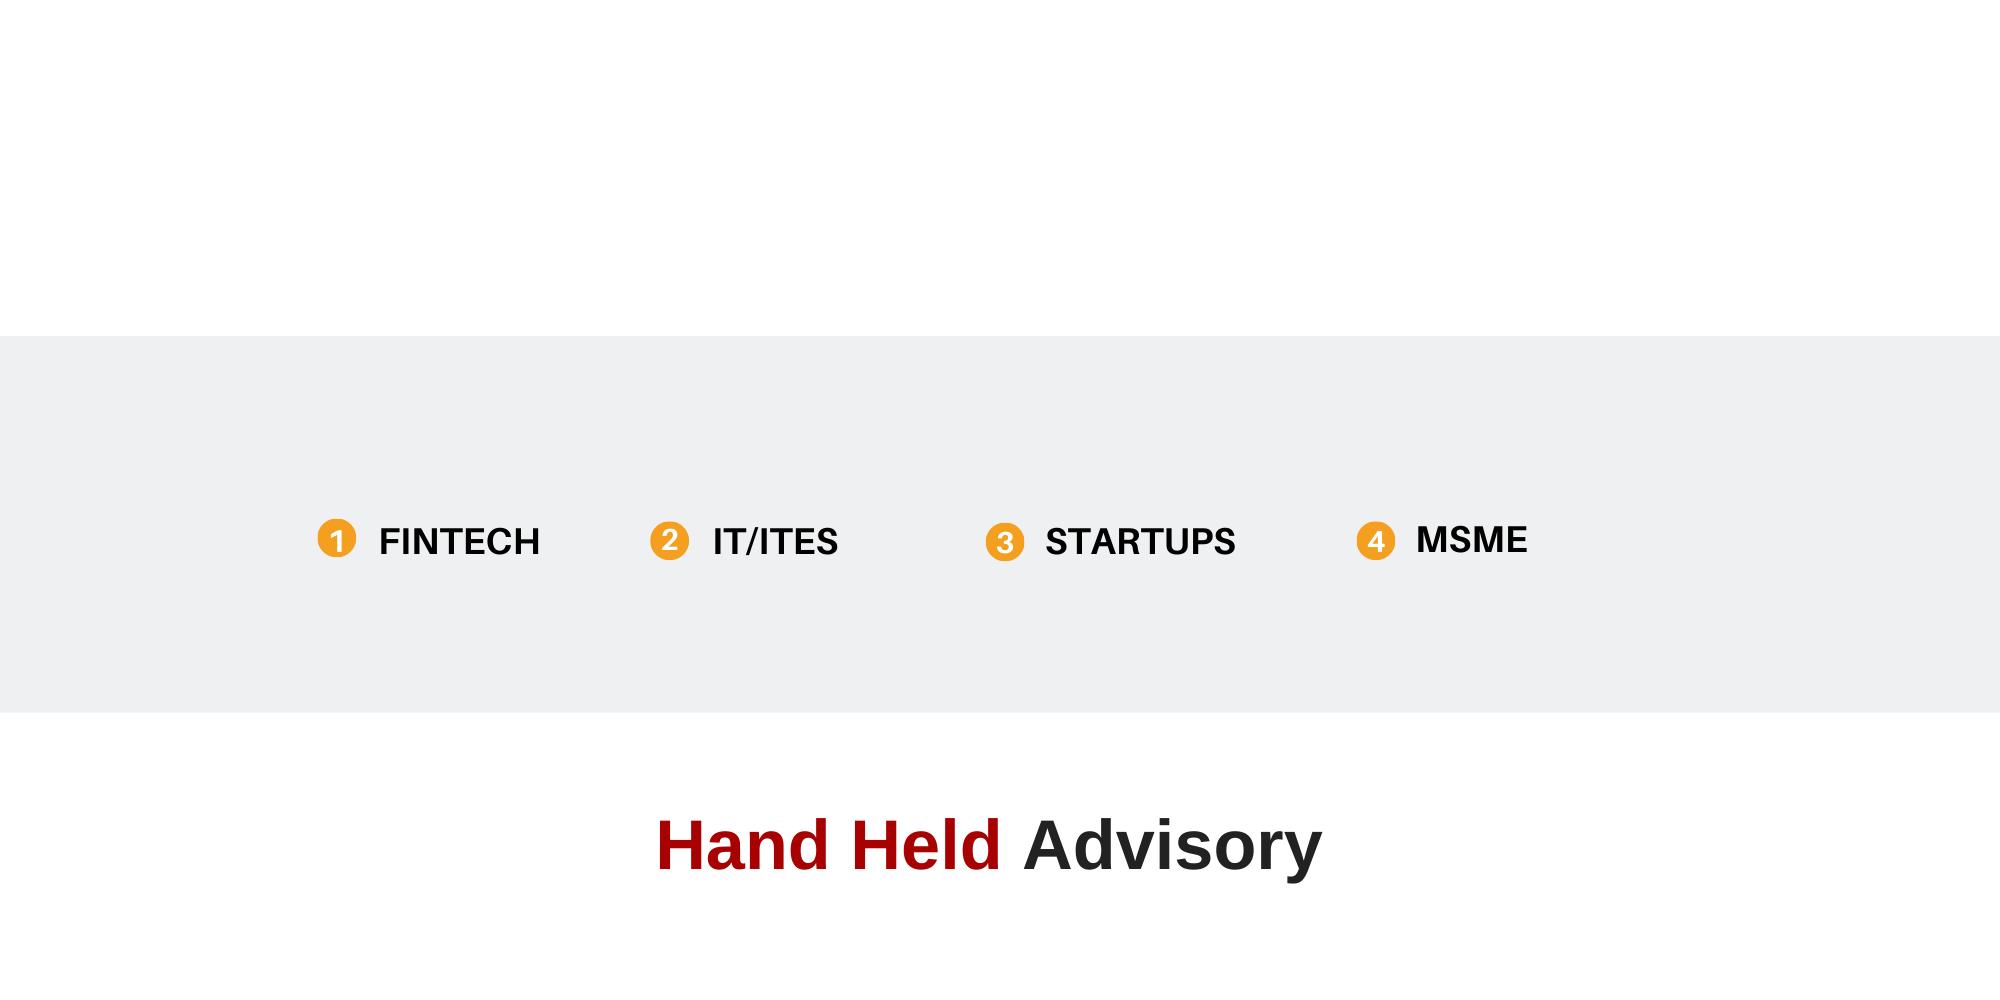 PRO HAND HELD ADVISORY